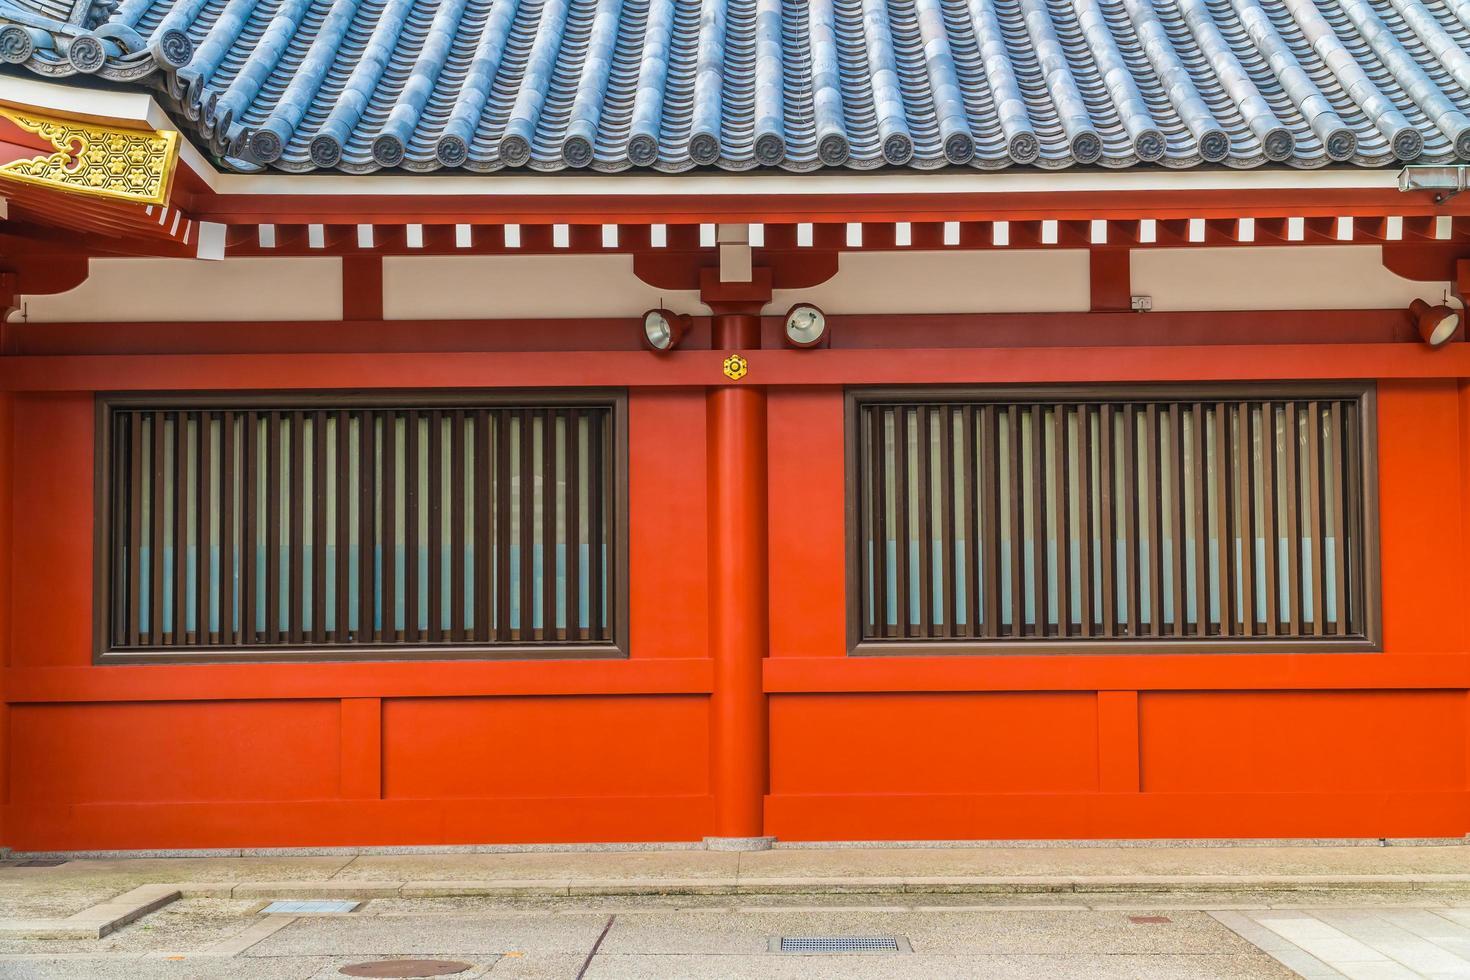 templo sensoji en el área de asakusa, tokio, japón foto